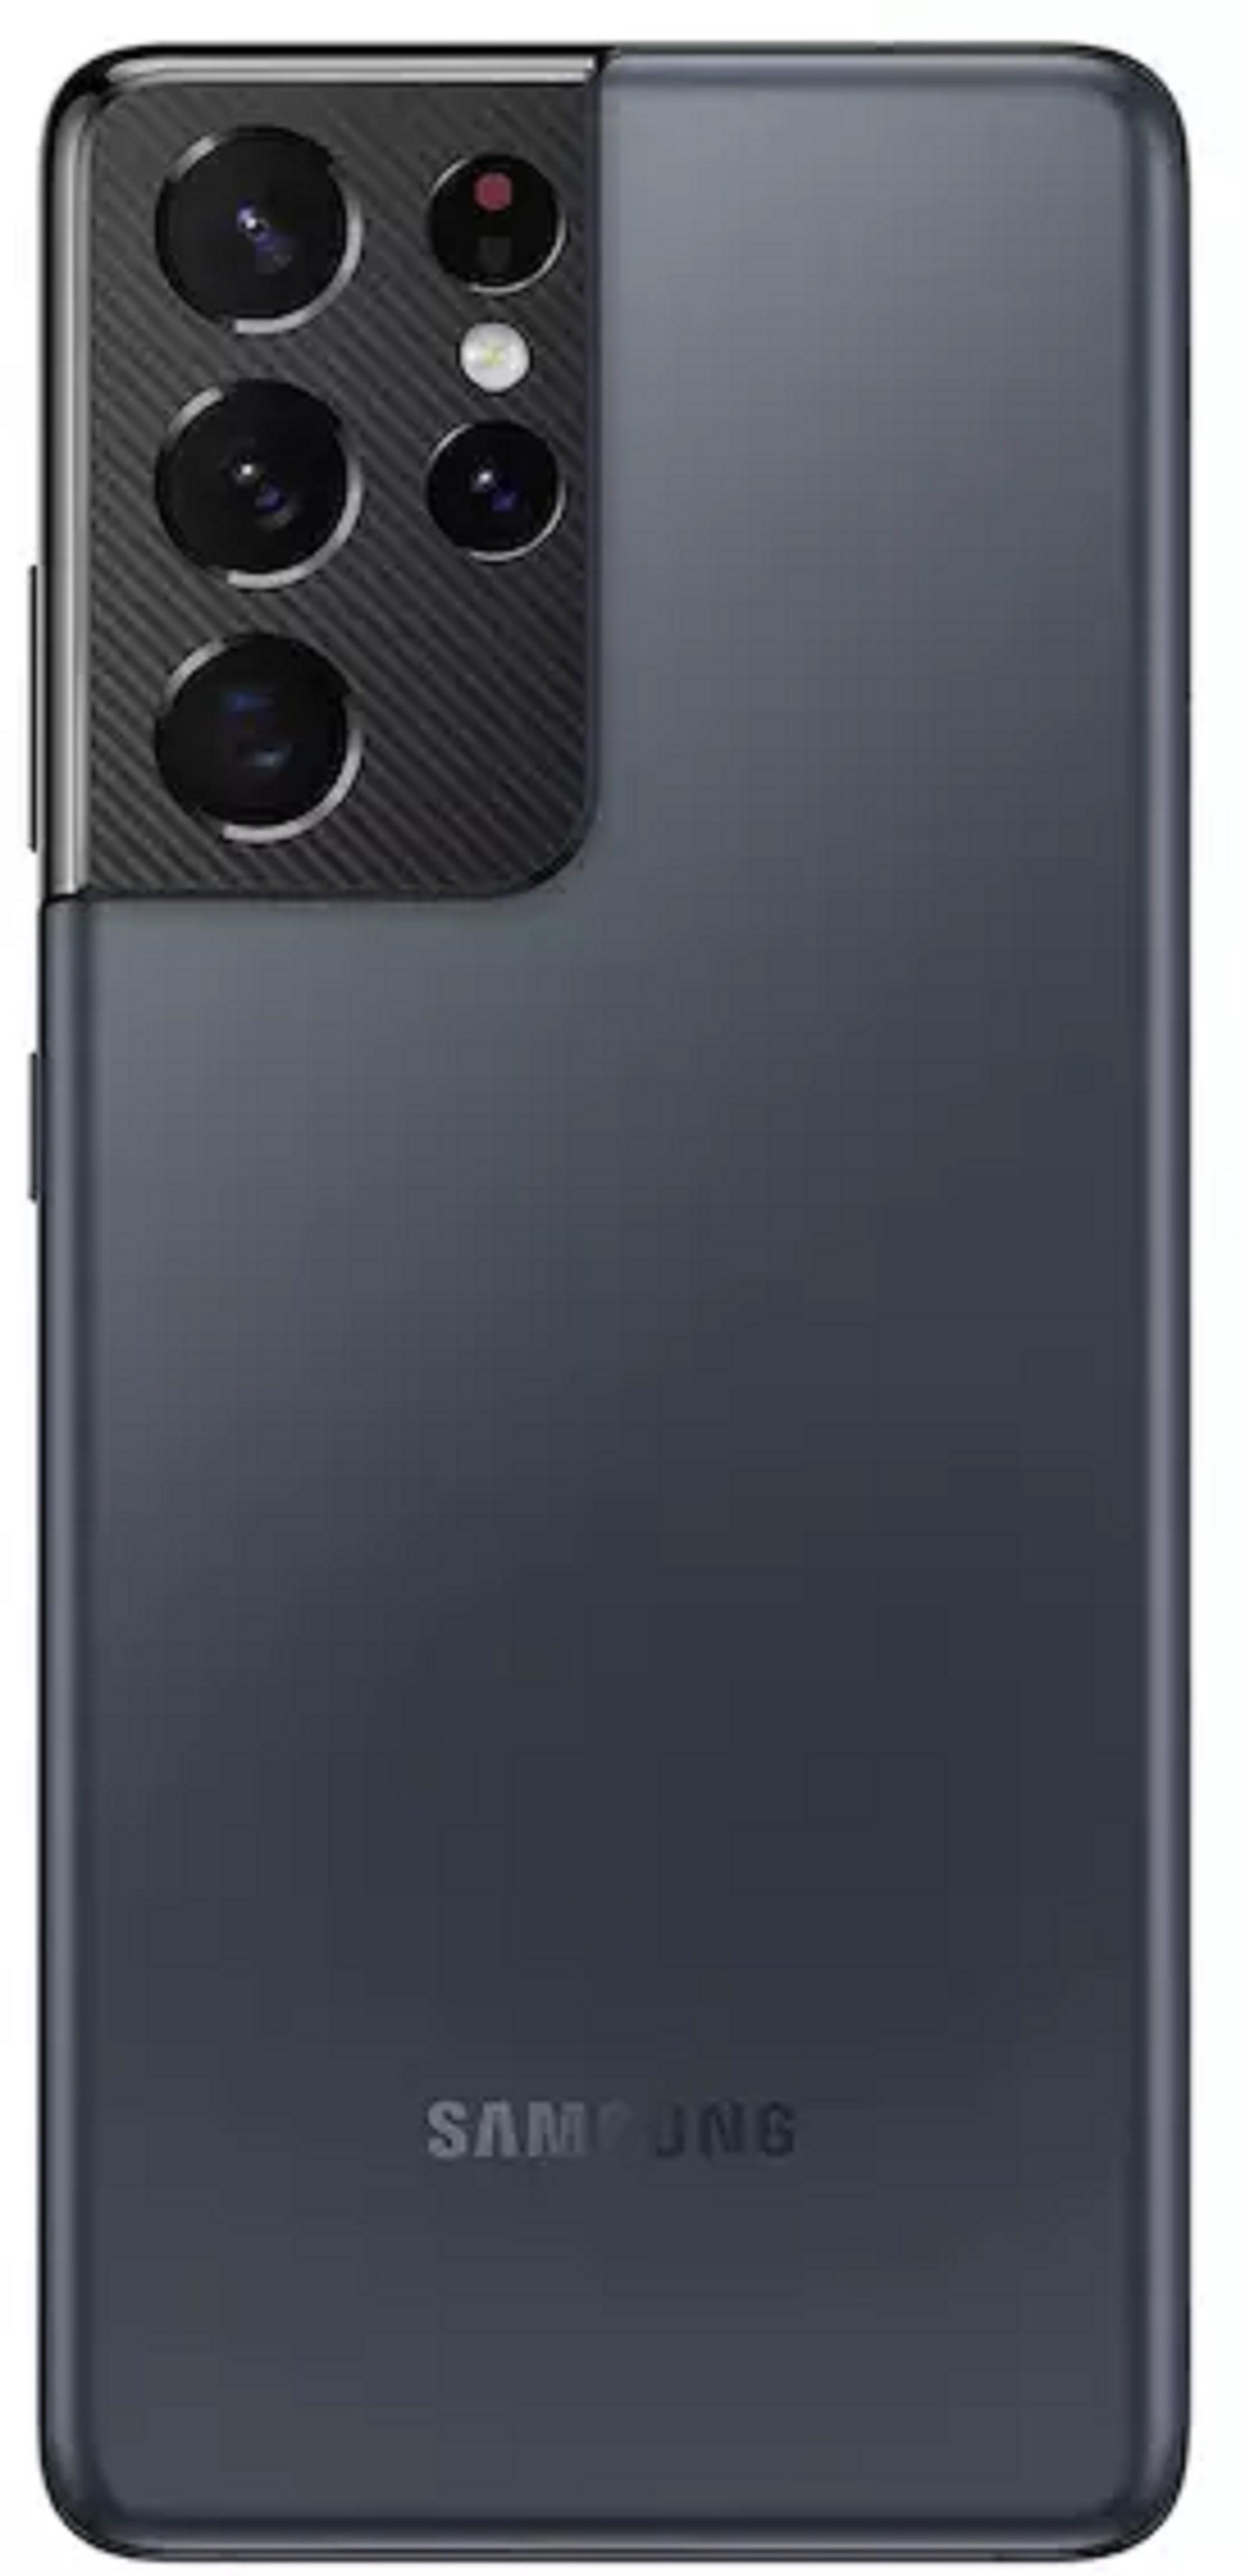 thumbnail 16 - Samsung Galaxy G998U S21 Ultra 5G 128GB Unlocked Smartphone - Excellent